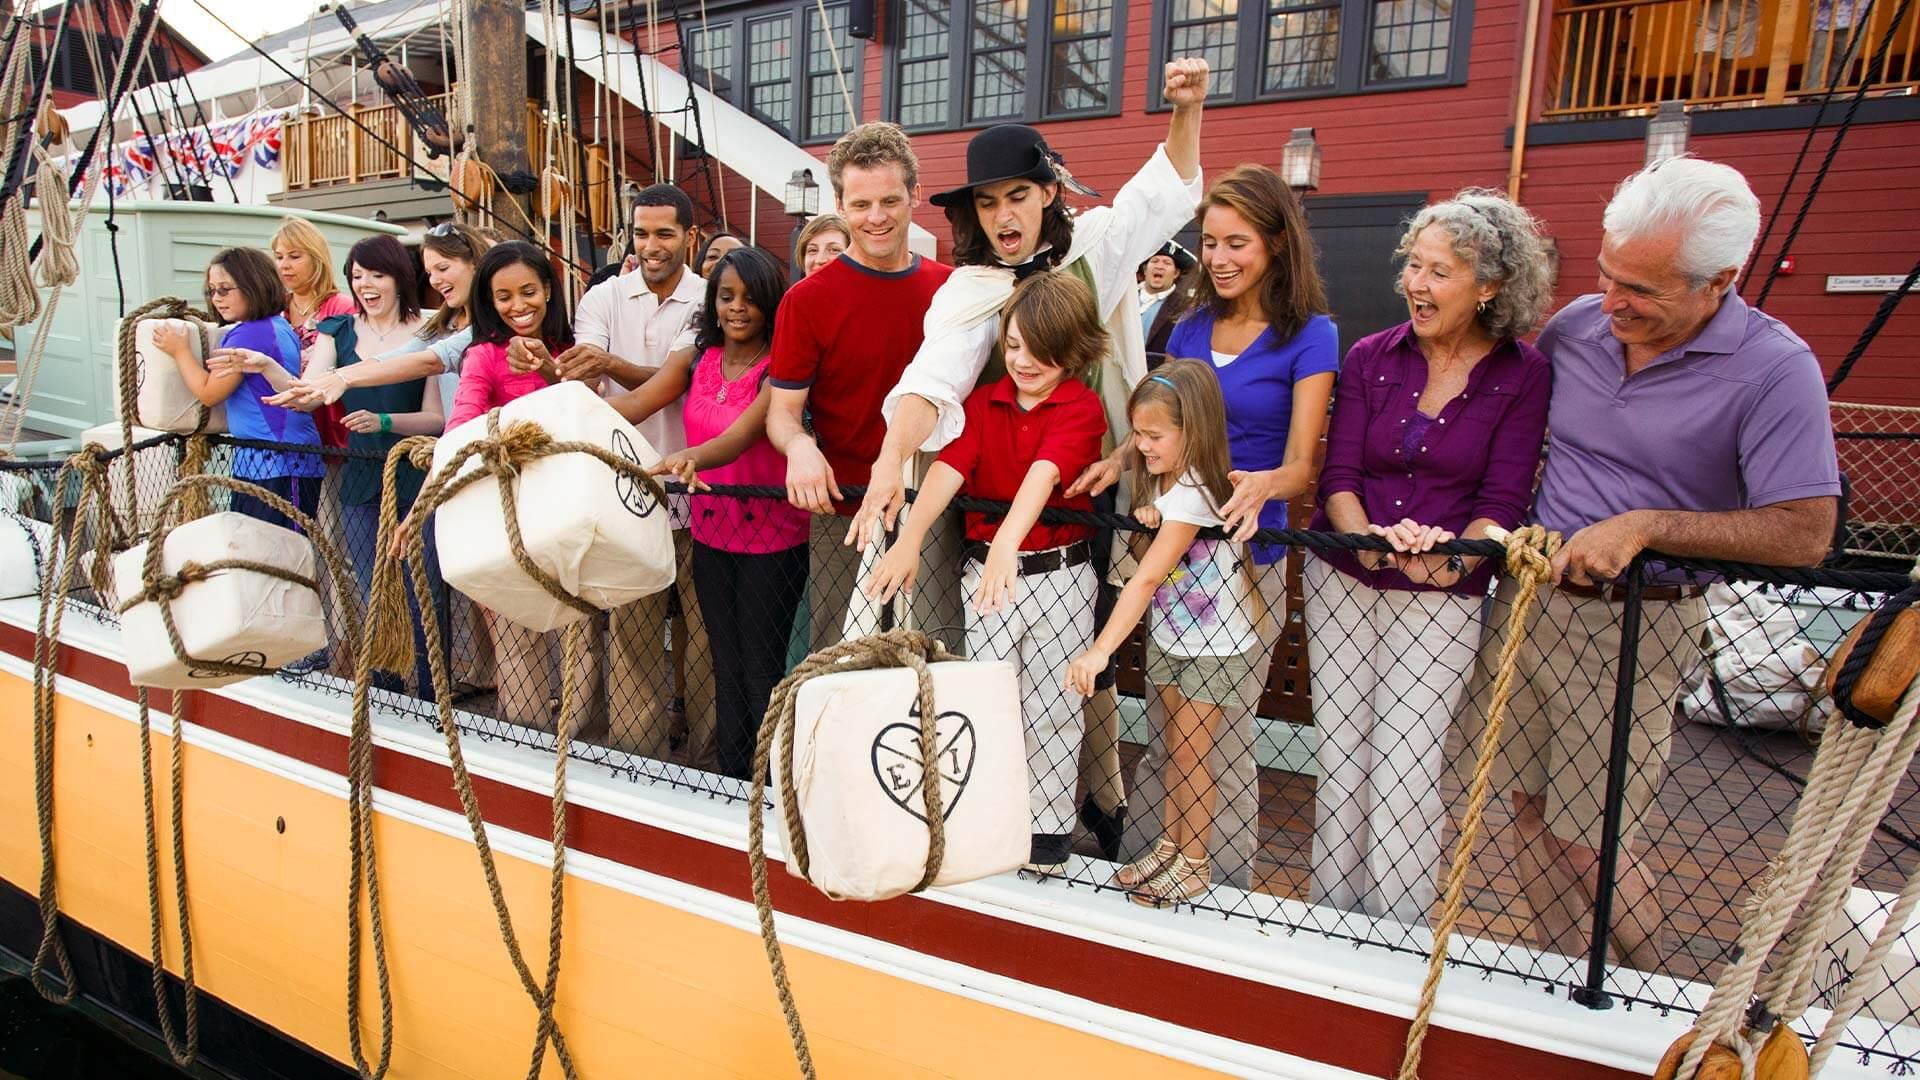 Boston Tea Party Ships Museum Annual Reenactment